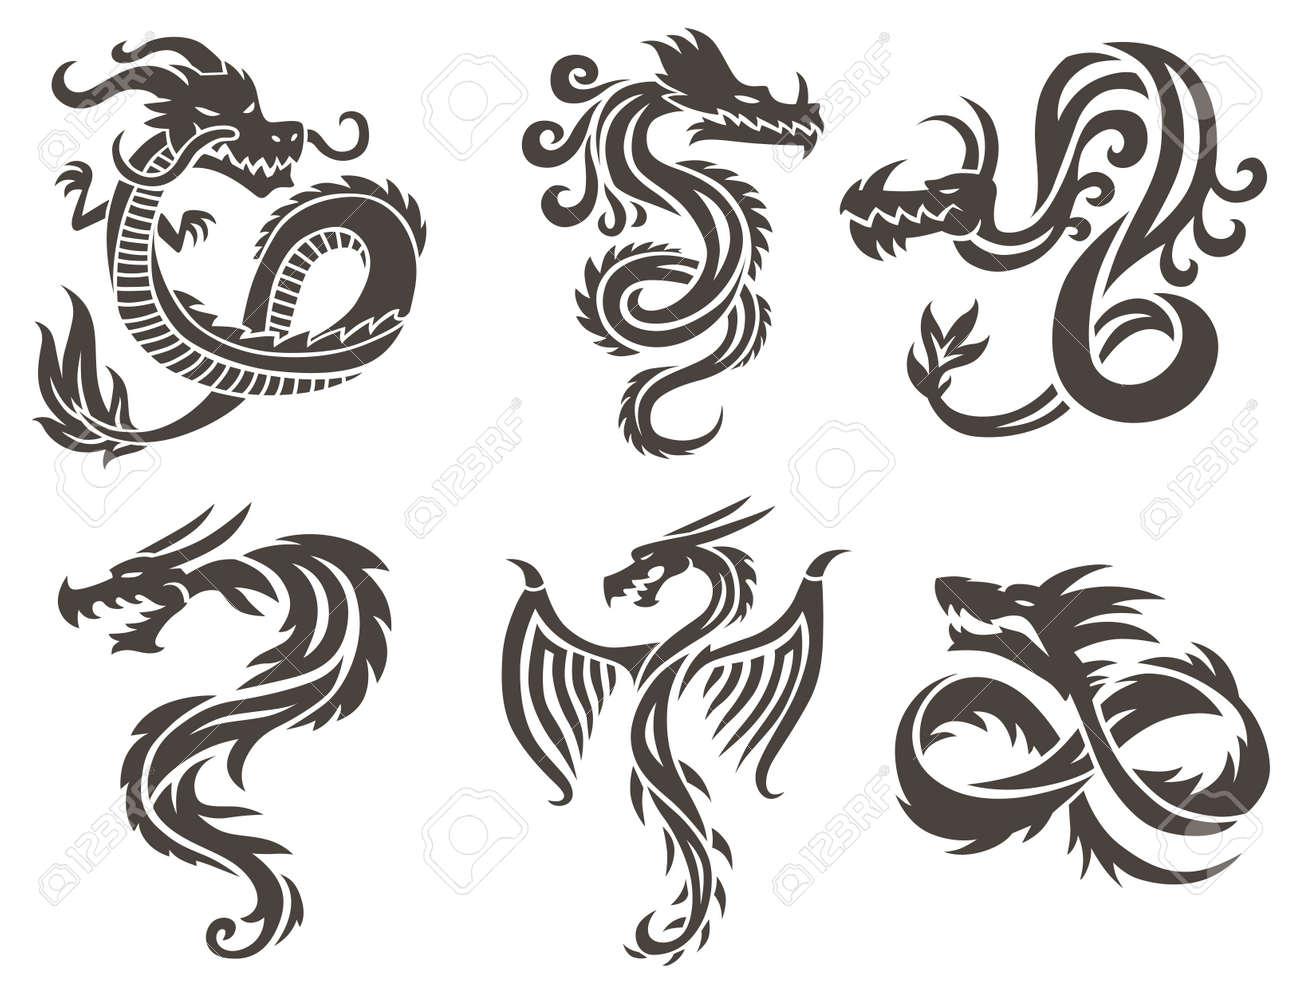 Dragon Tattoo white background vector illustration. Vector Chinese Dragon for the tattoo. Chinese dragon Tattoo. China Tattoo Dragon silhouette. China symbol dragon silhouette animal tattoo. - 53326780